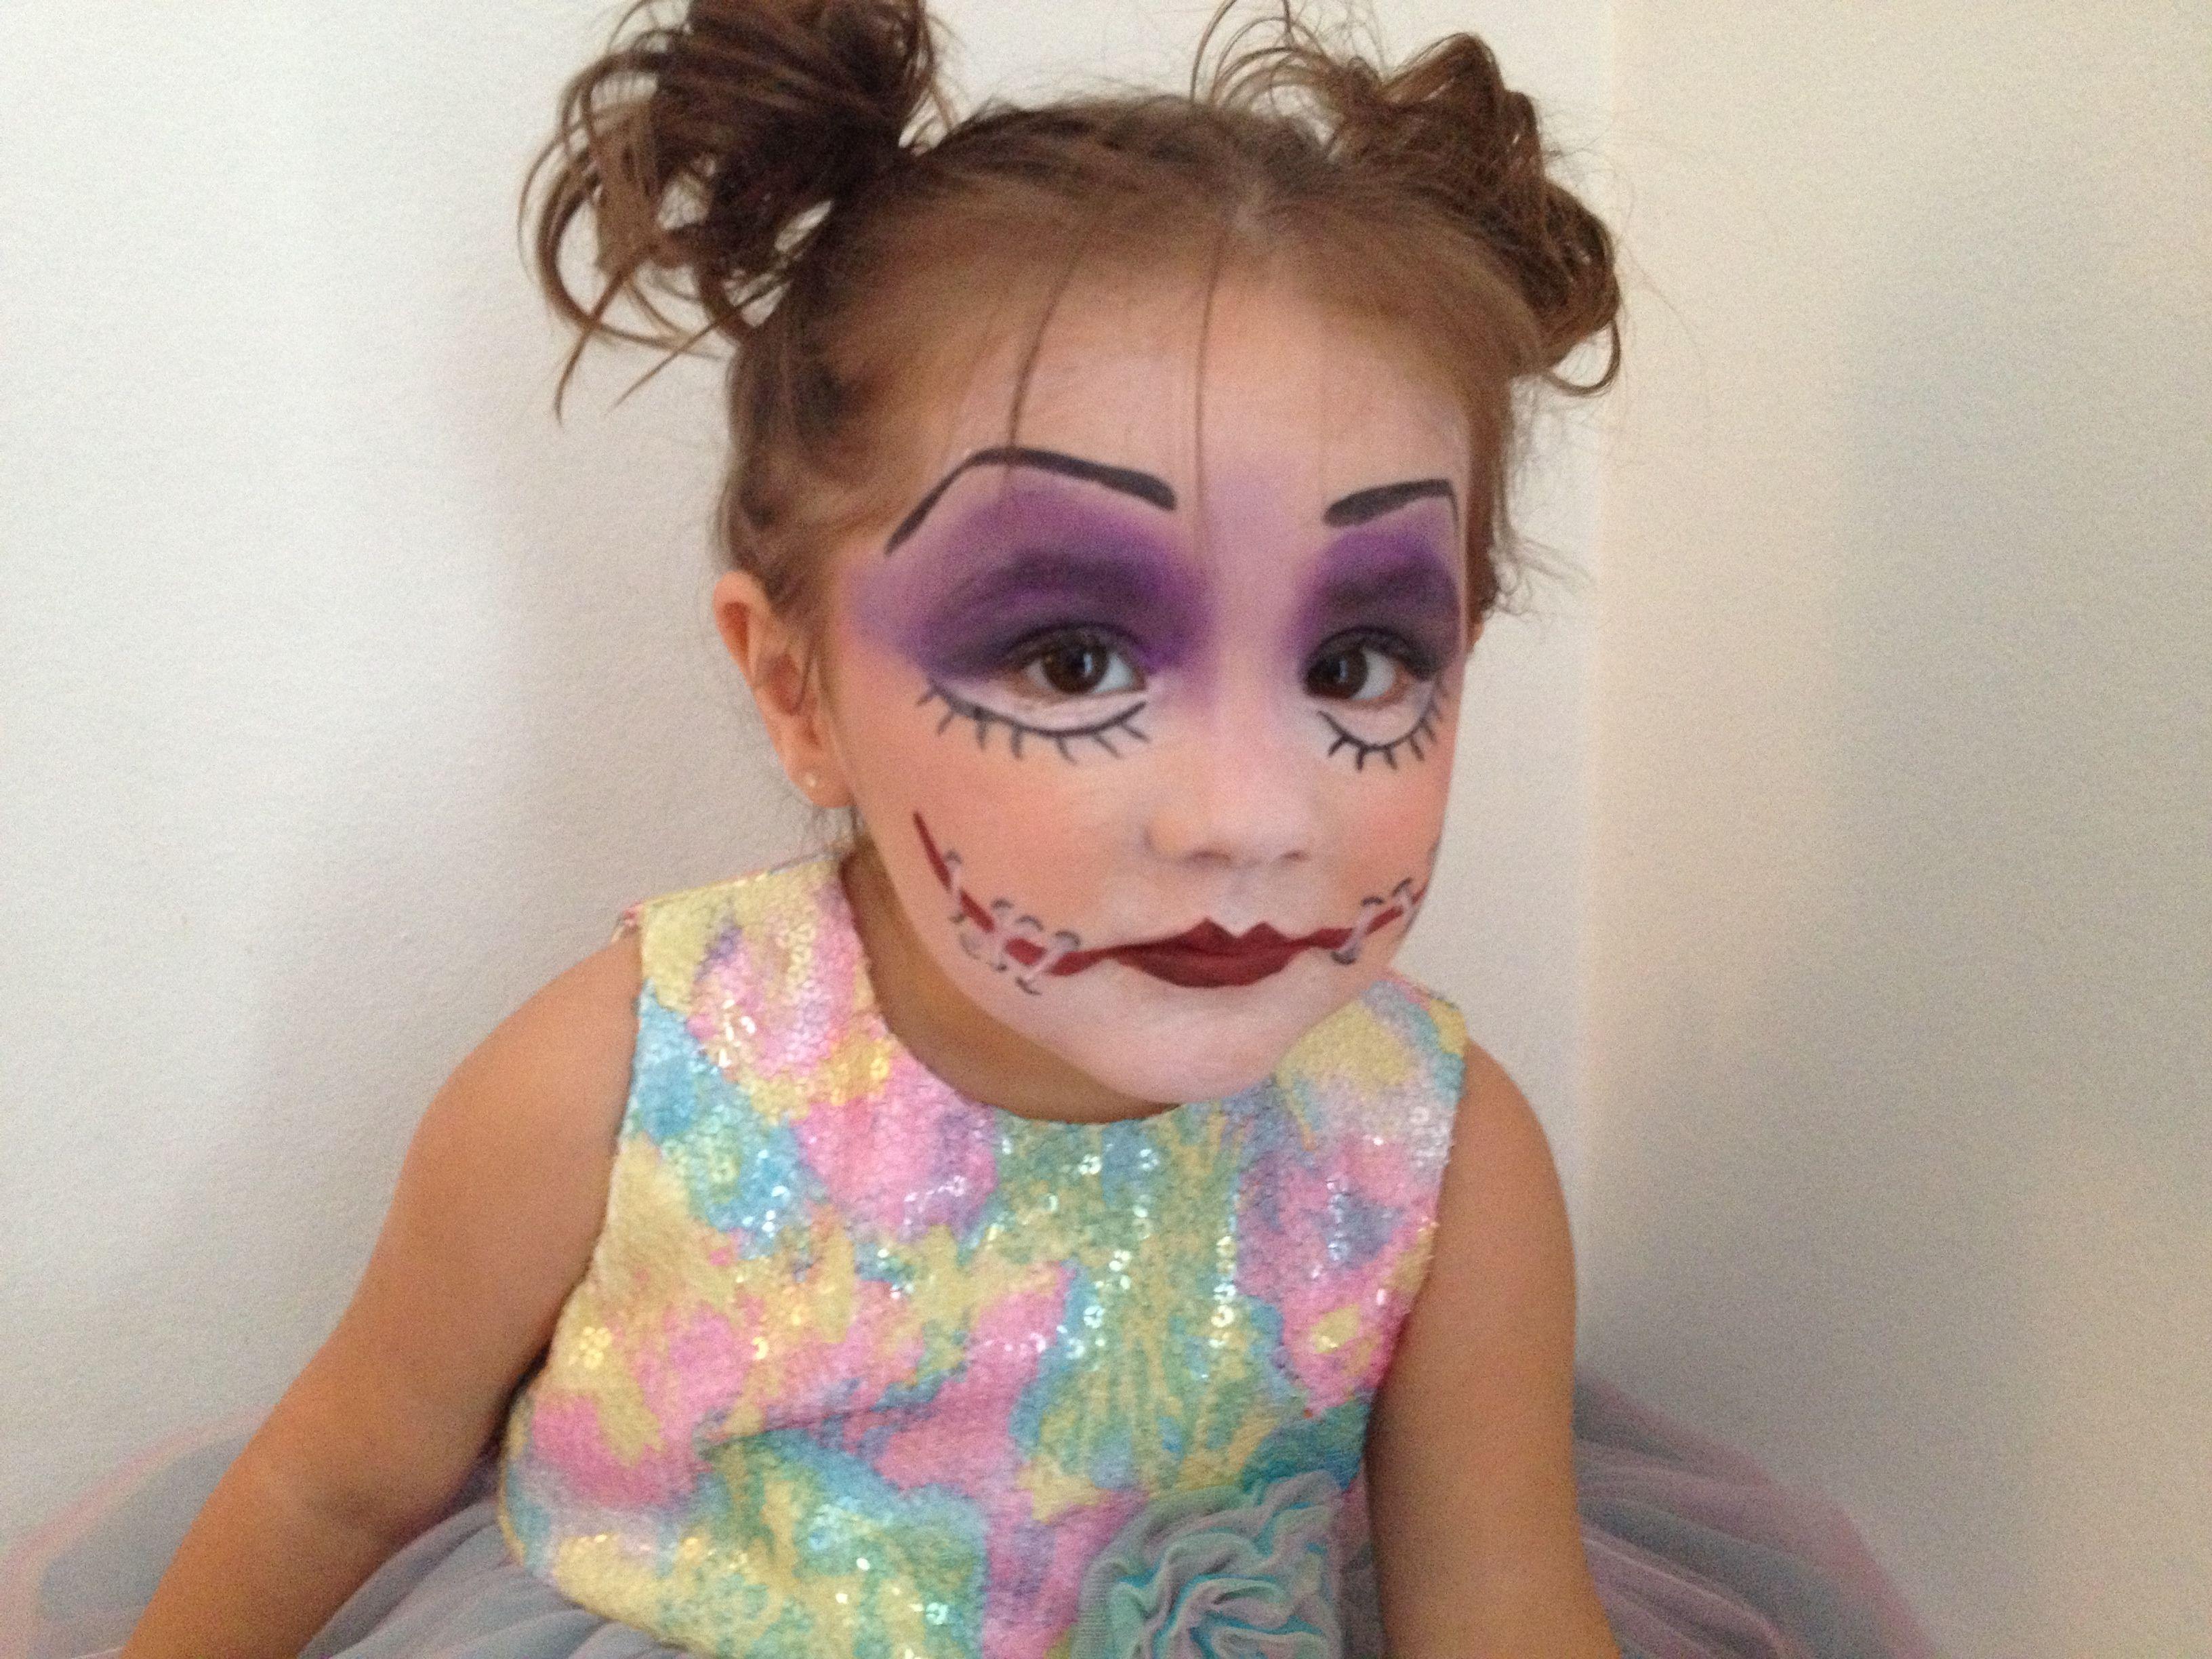 Creepy little doll face painting, great Halloween makeup idea ...